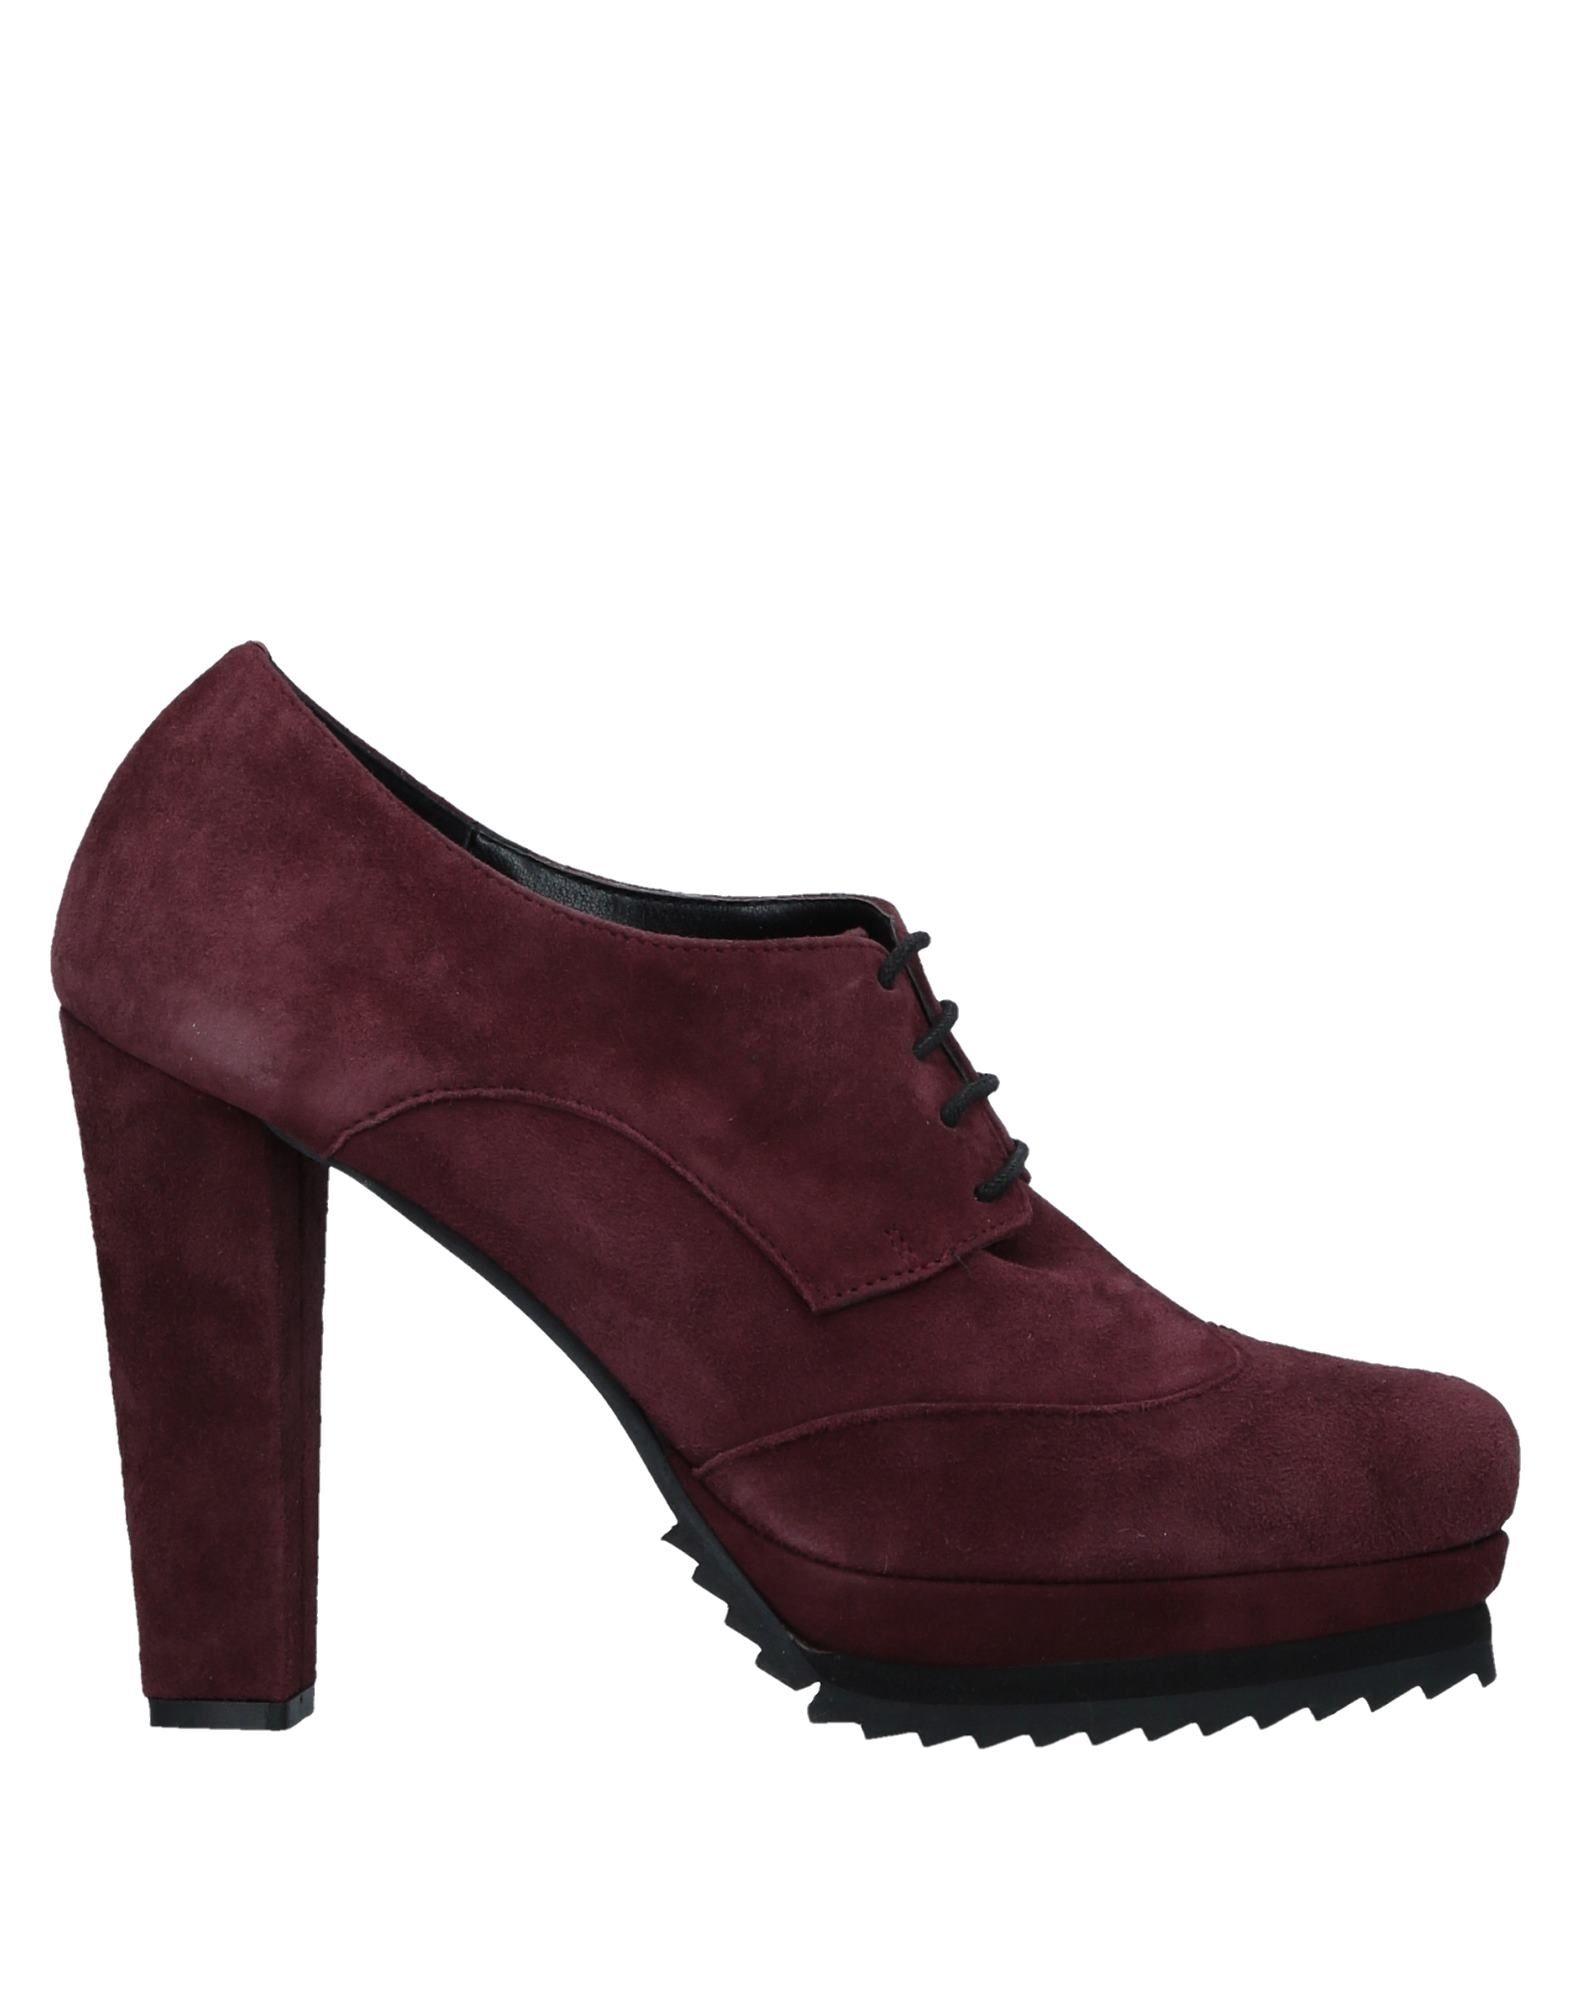 ANNA B. dal 1943 Обувь на шнурках dal dosso® перчатки